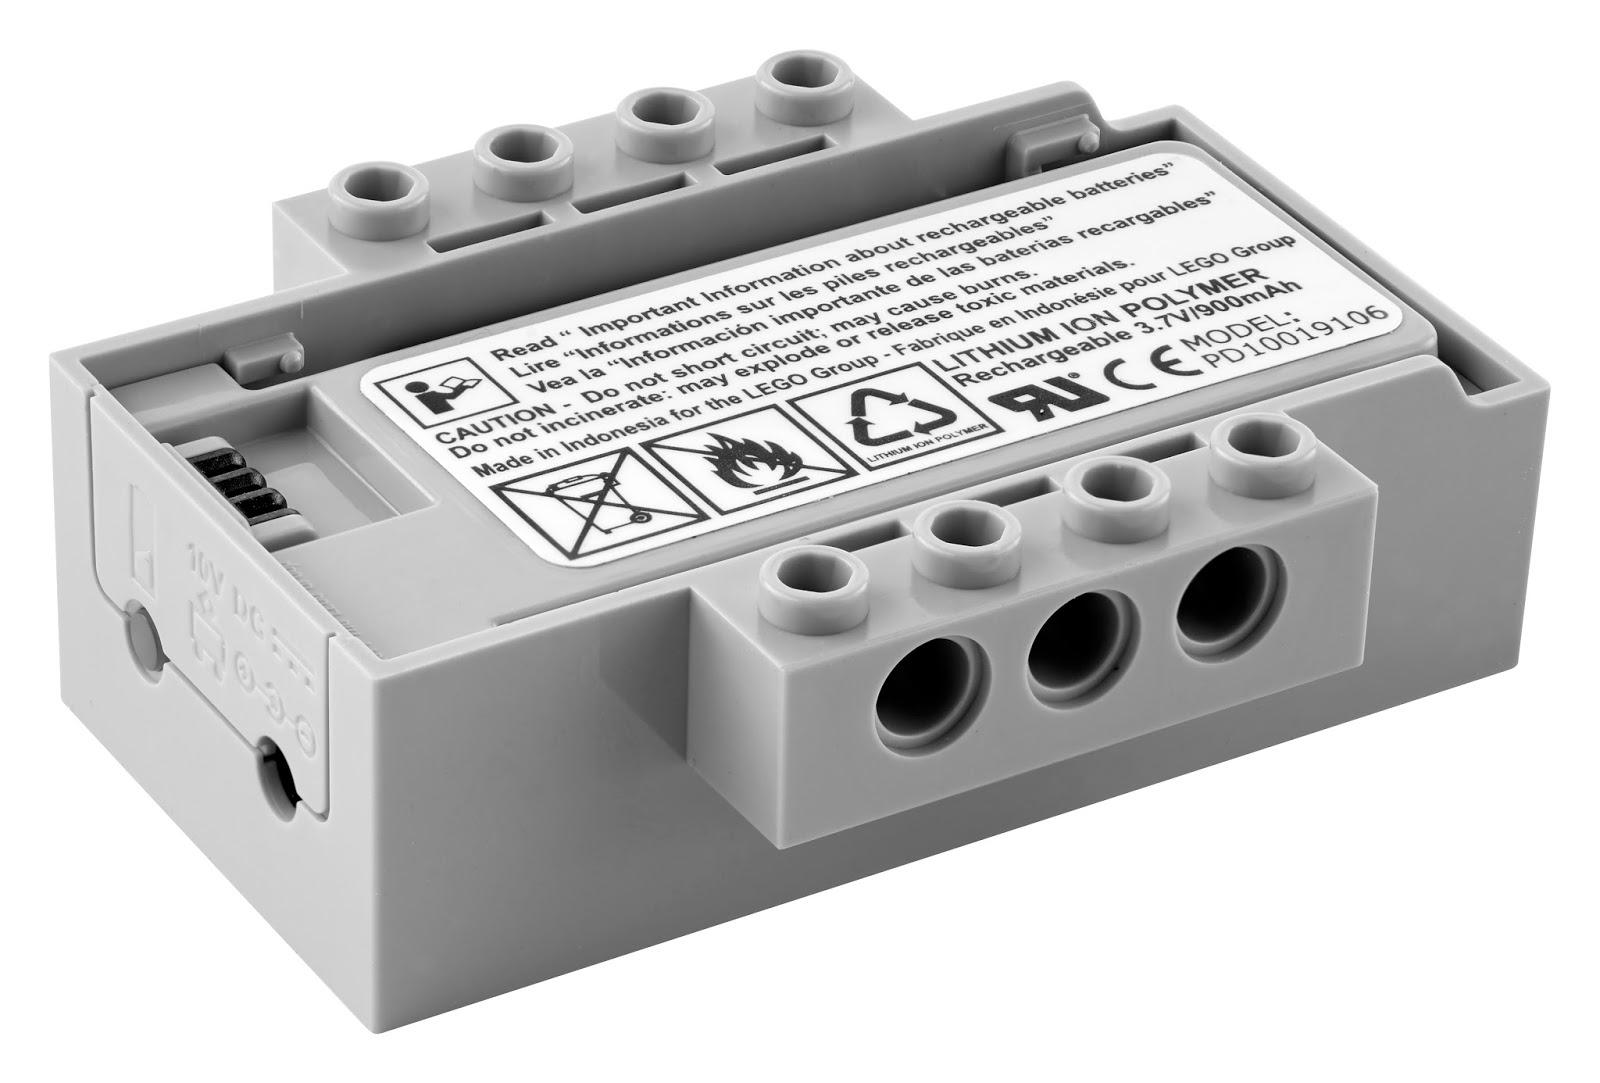 TechnicBRICKs: WeDo 2.0 - the new parts